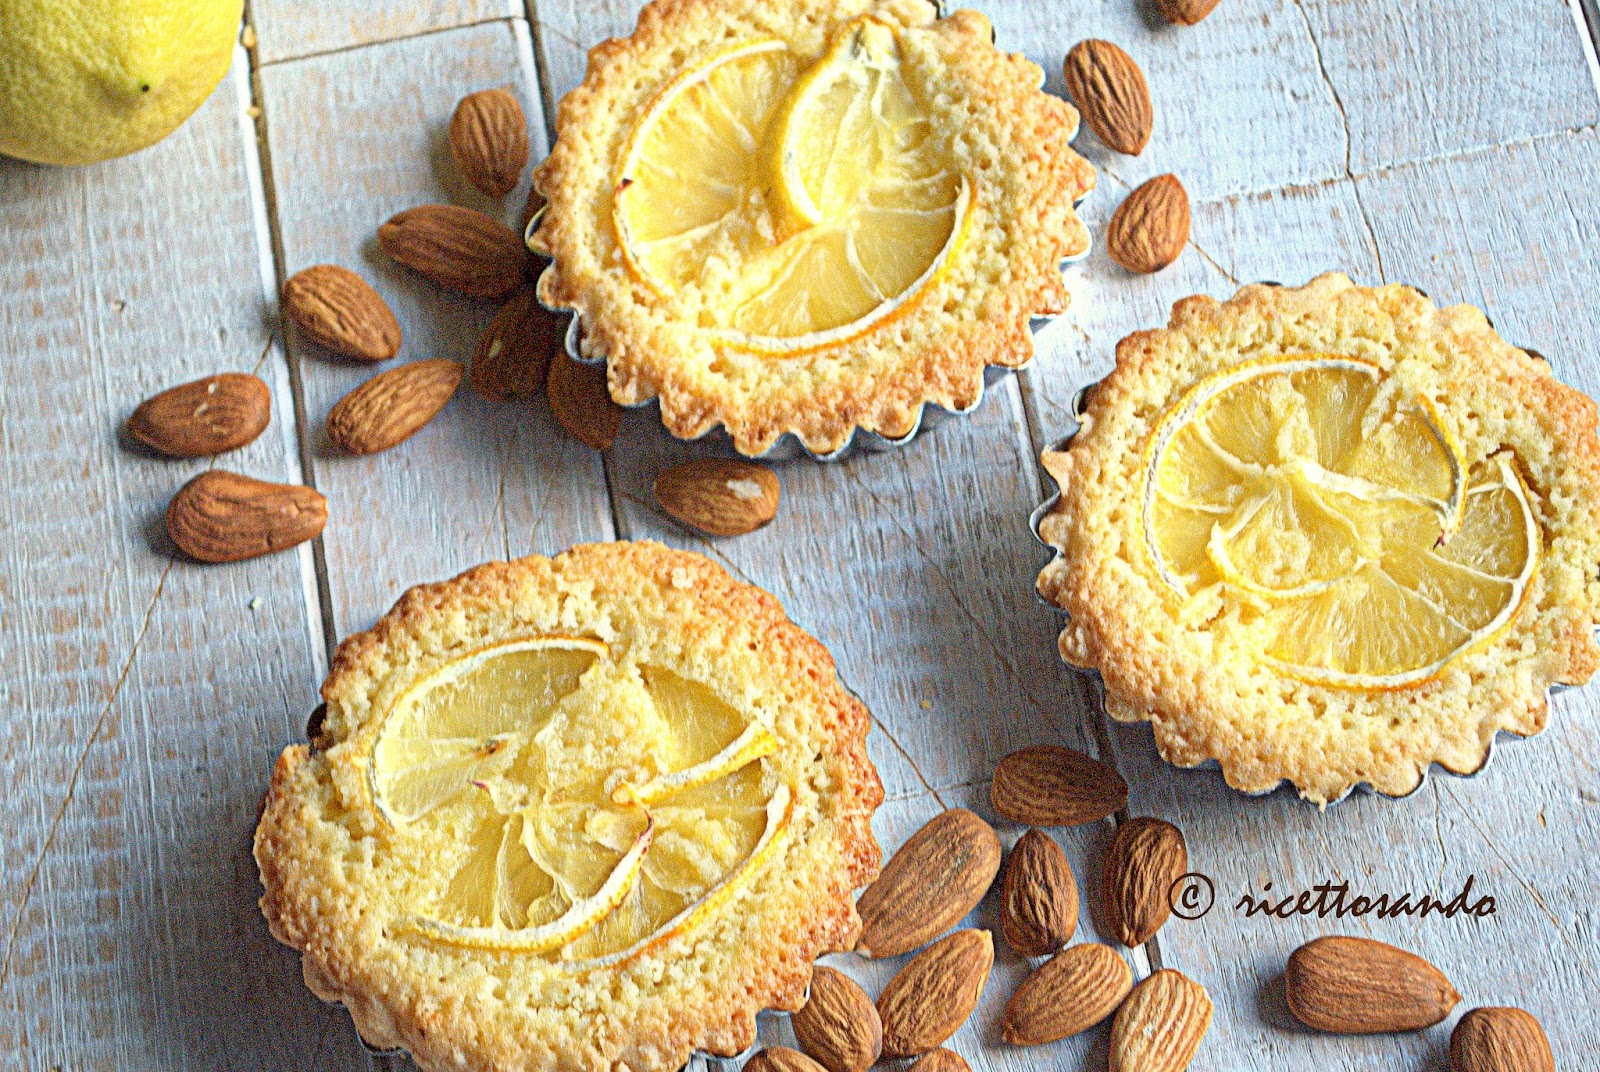 Crostatine al limone e frangipane ricetta dolce